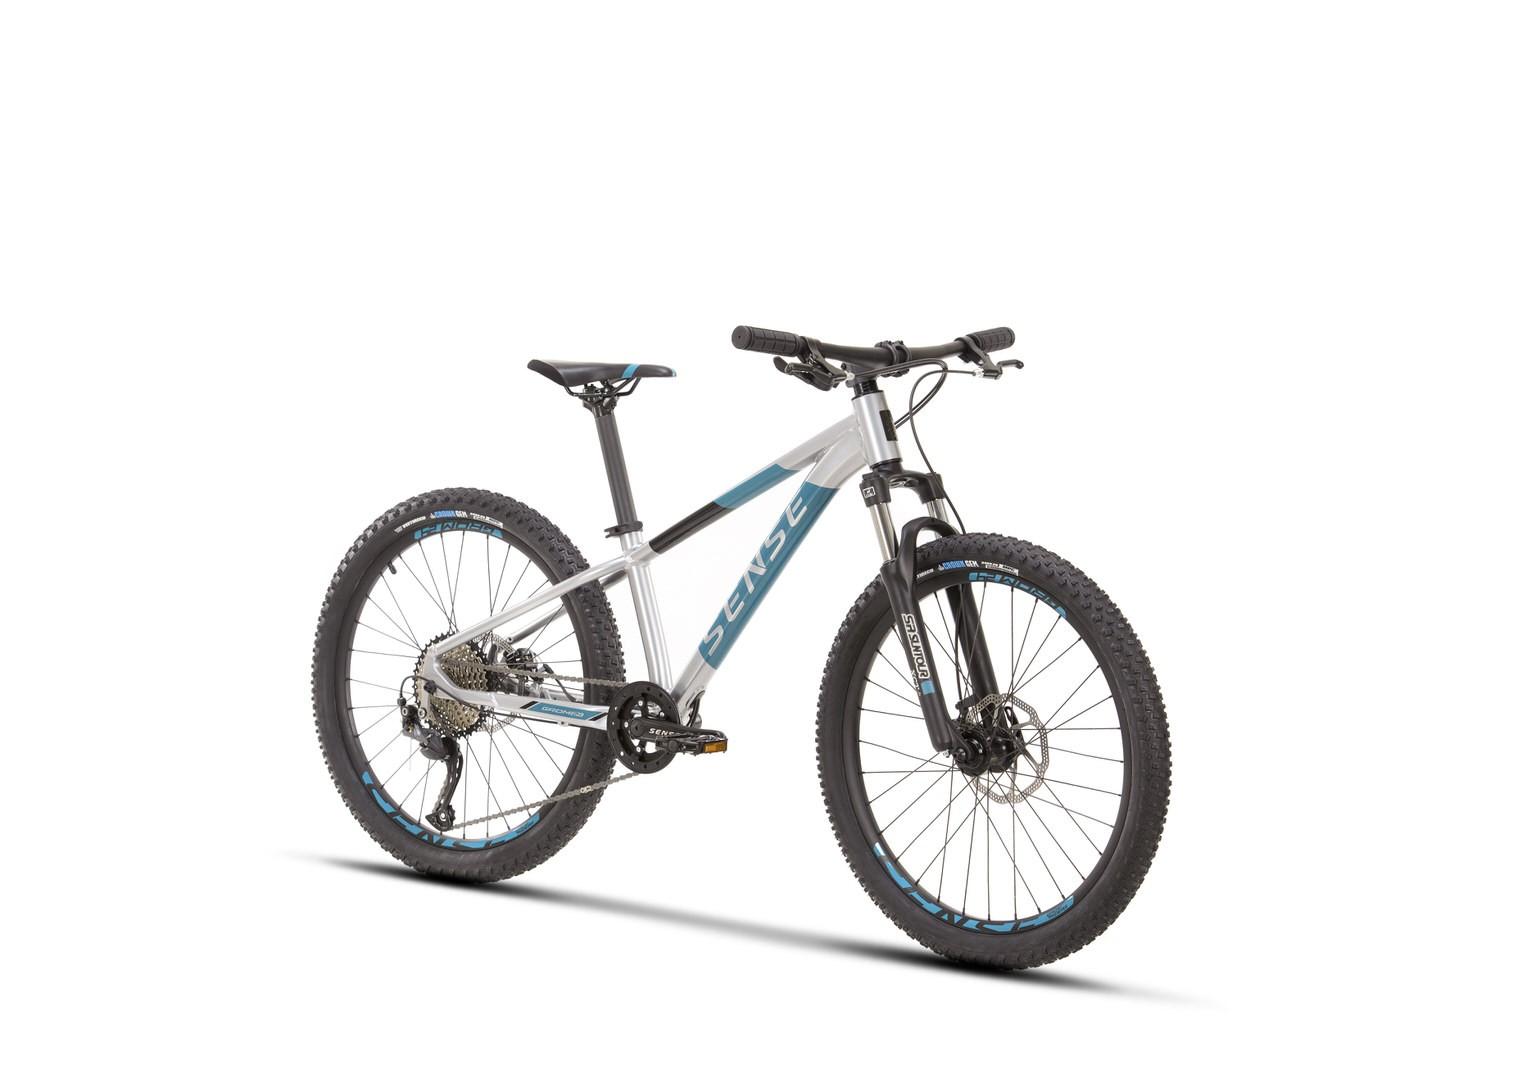 Bicicleta Sense Grom 20 2021/22 Alumínio